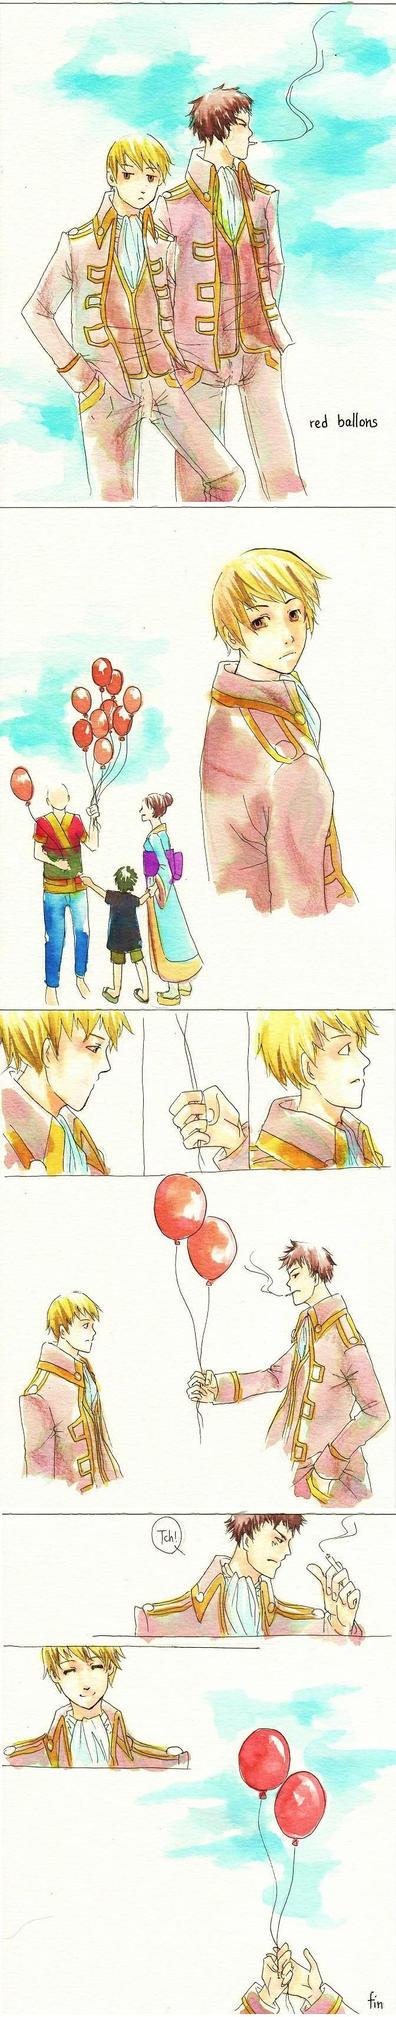 Gintama - Red Ballons by Yishuu